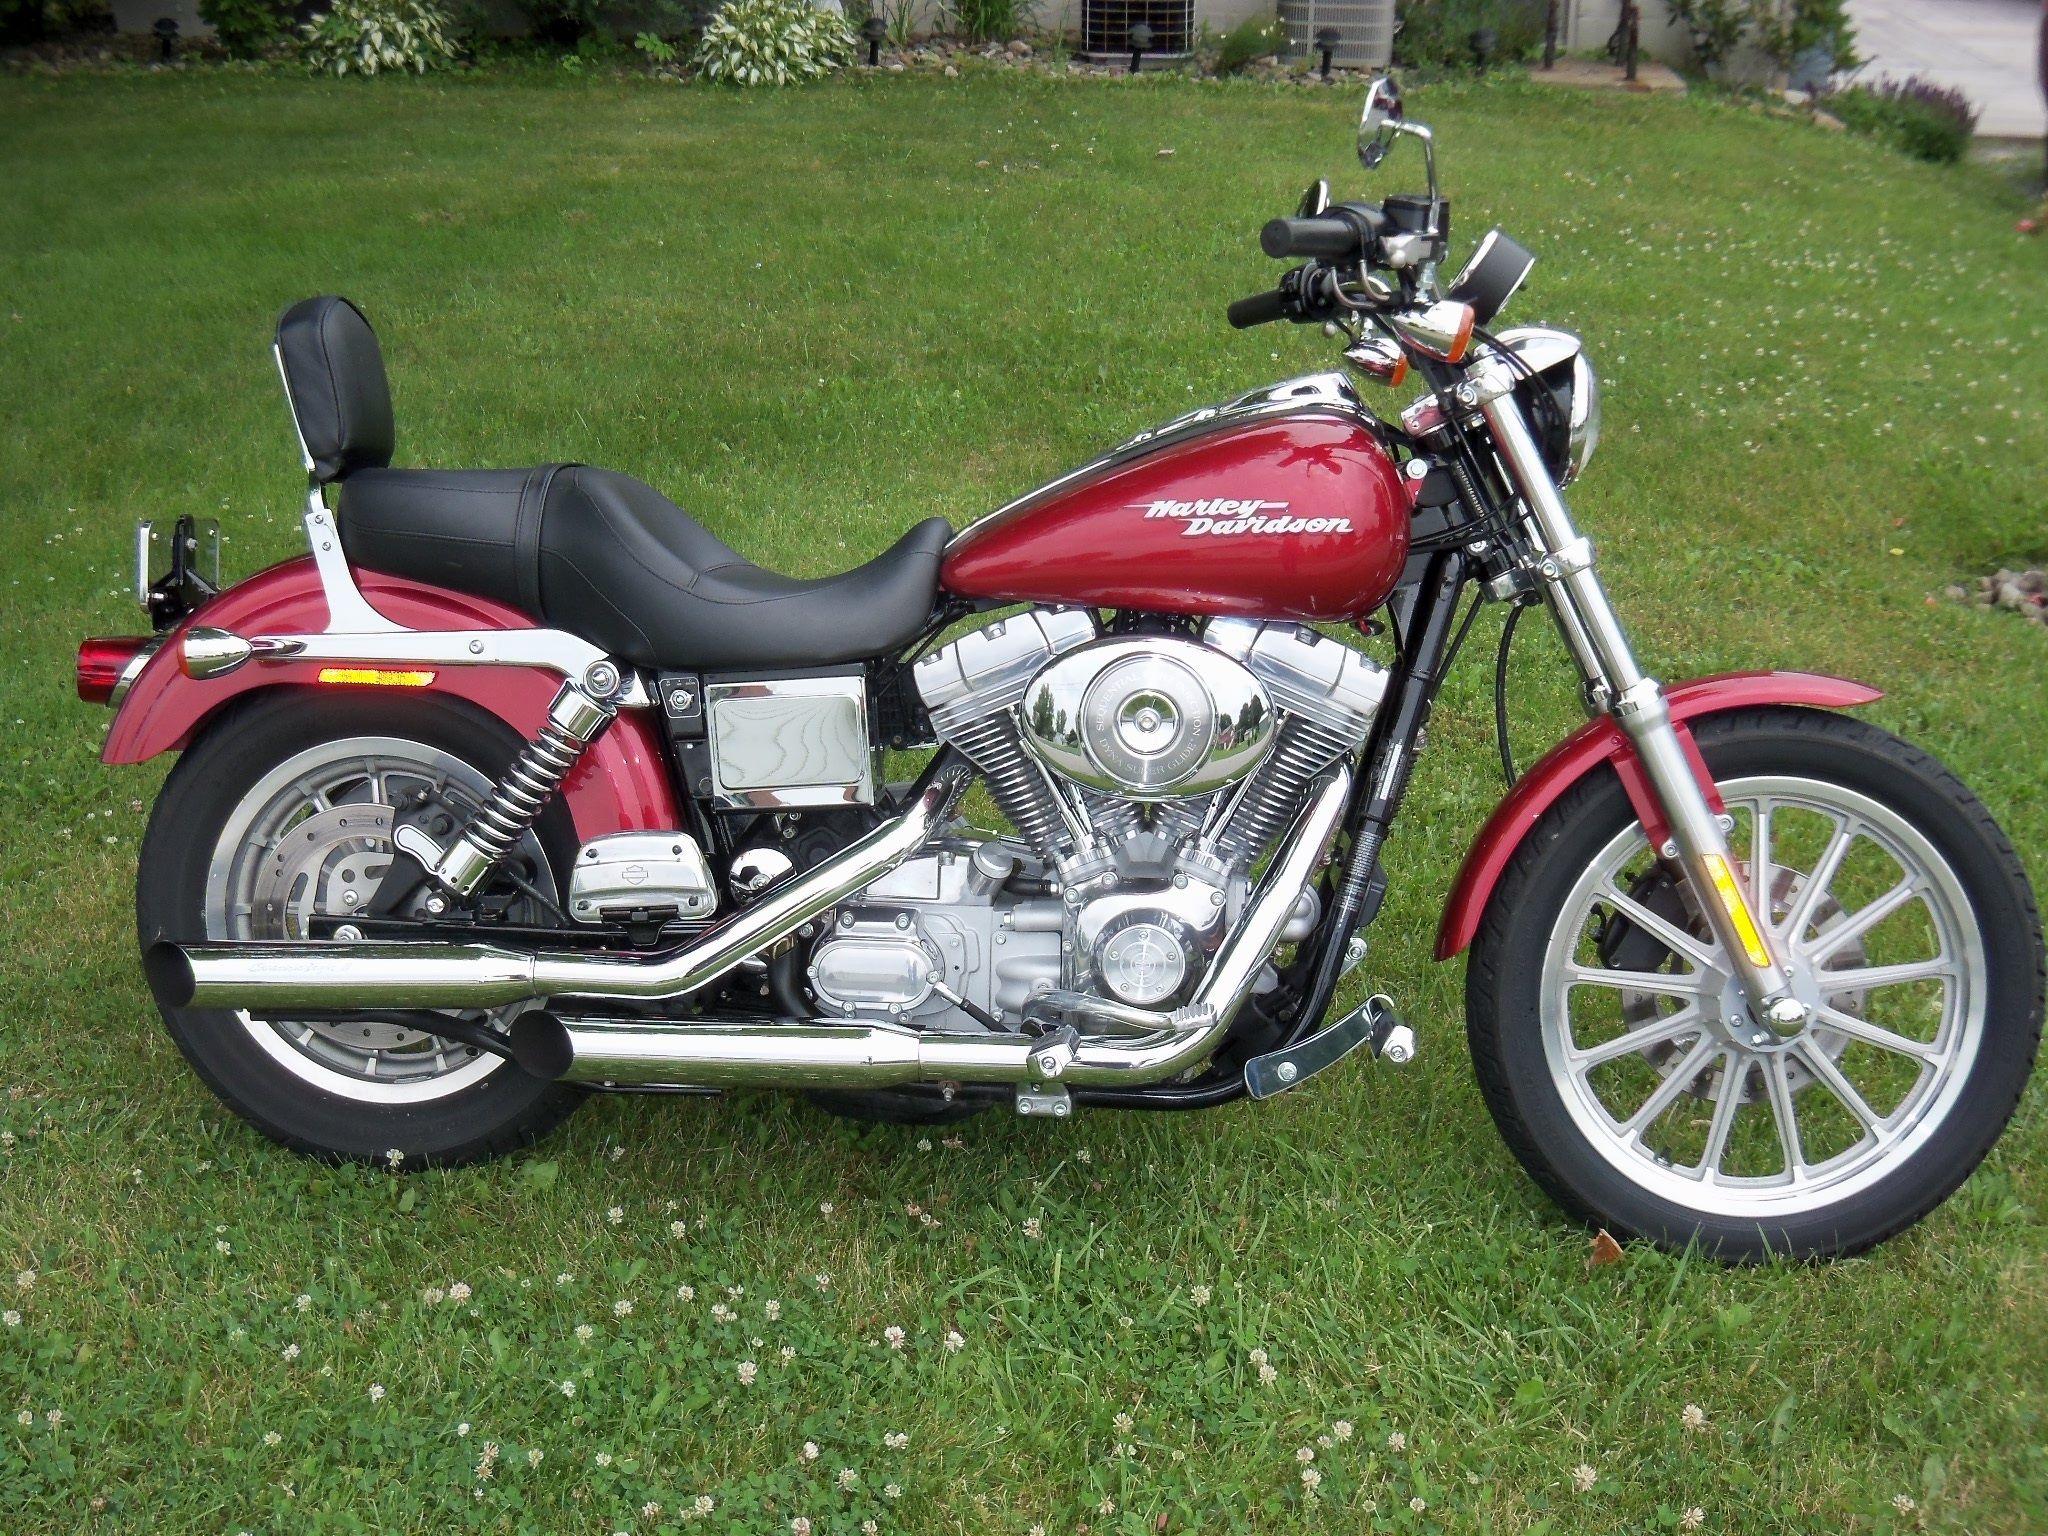 My Harley. 2004 Dyna Super Glide.